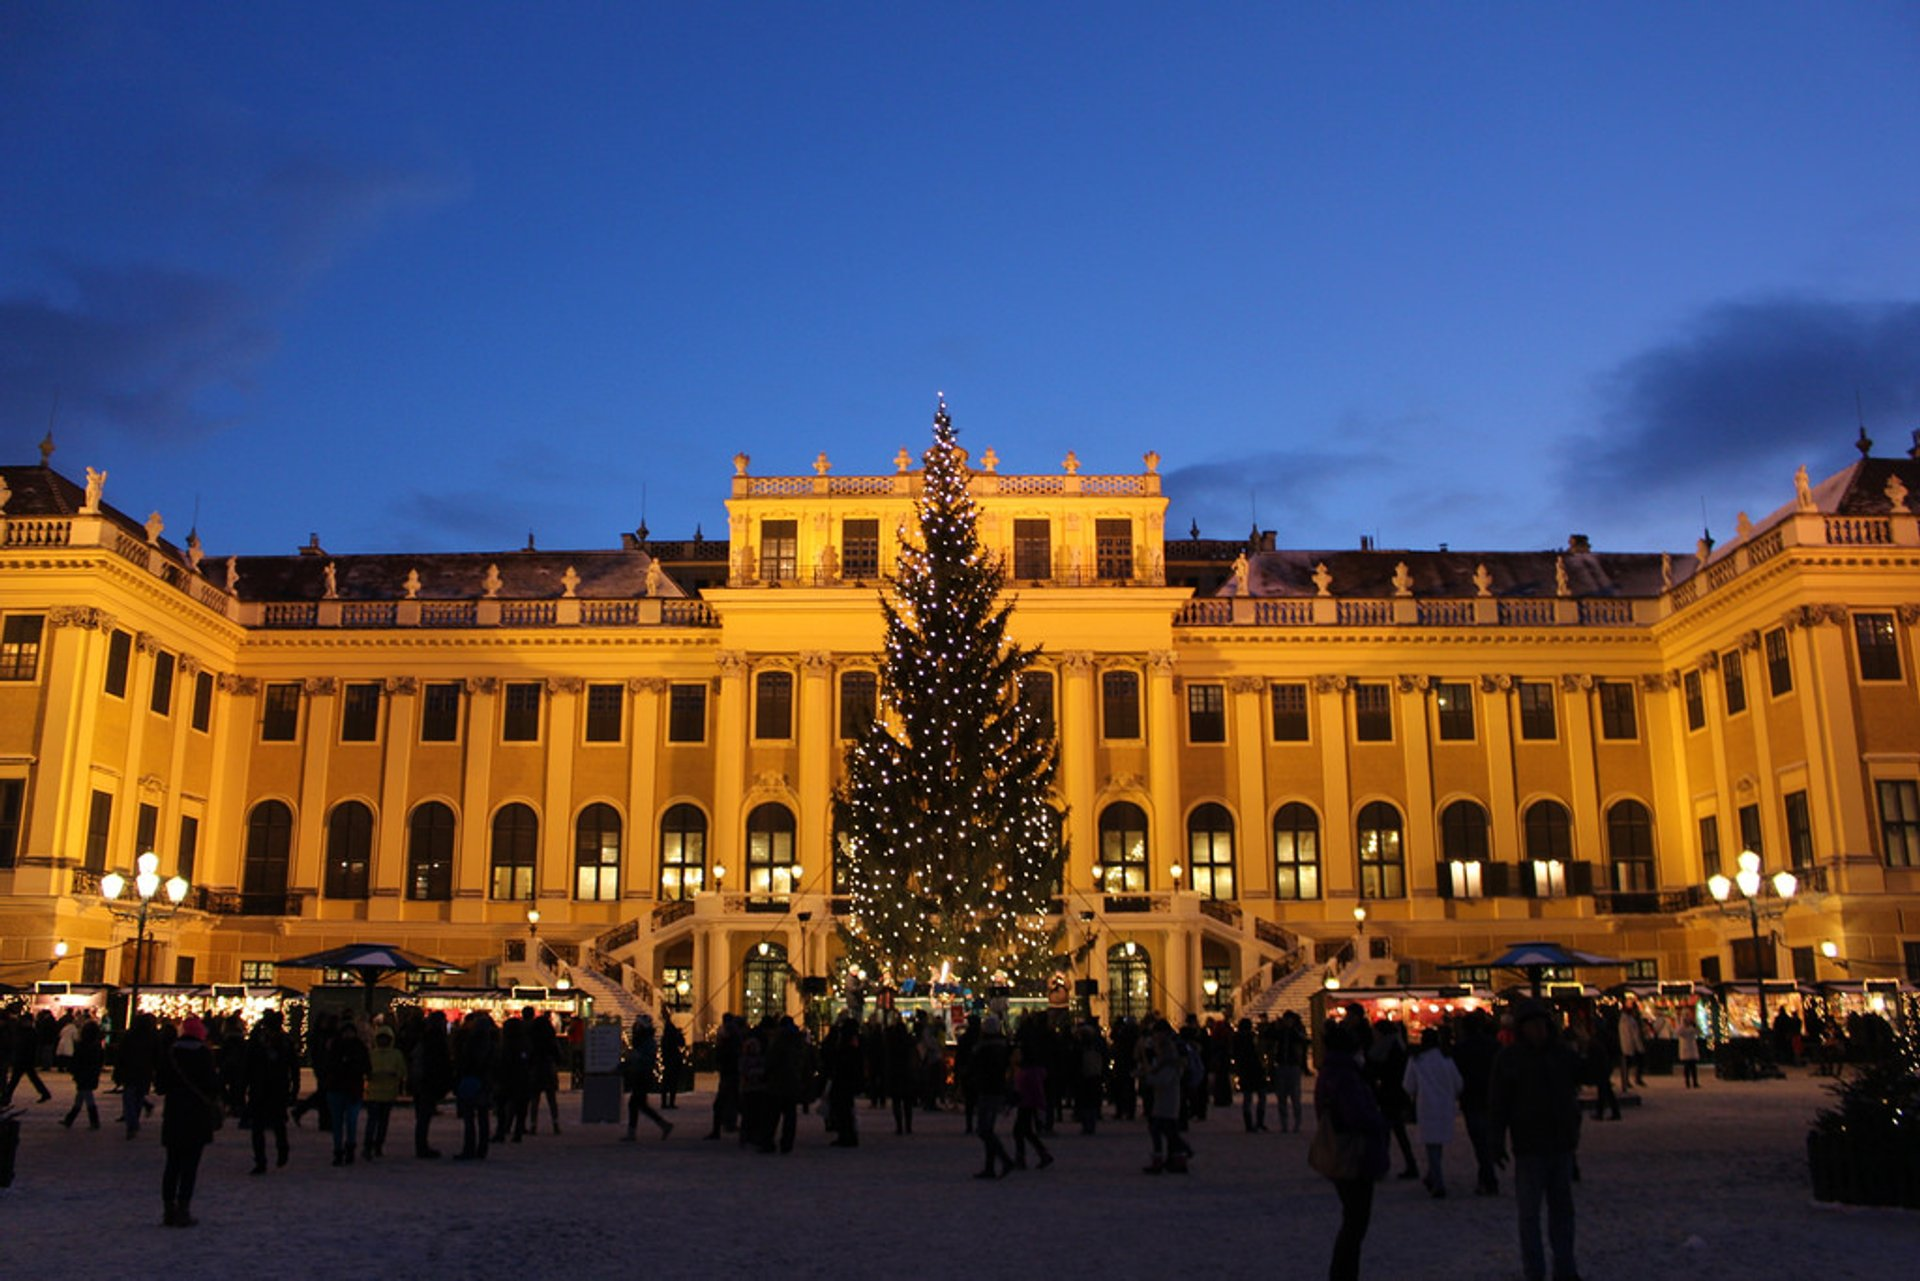 Christmas Market at Schönbrunn Palace 2020